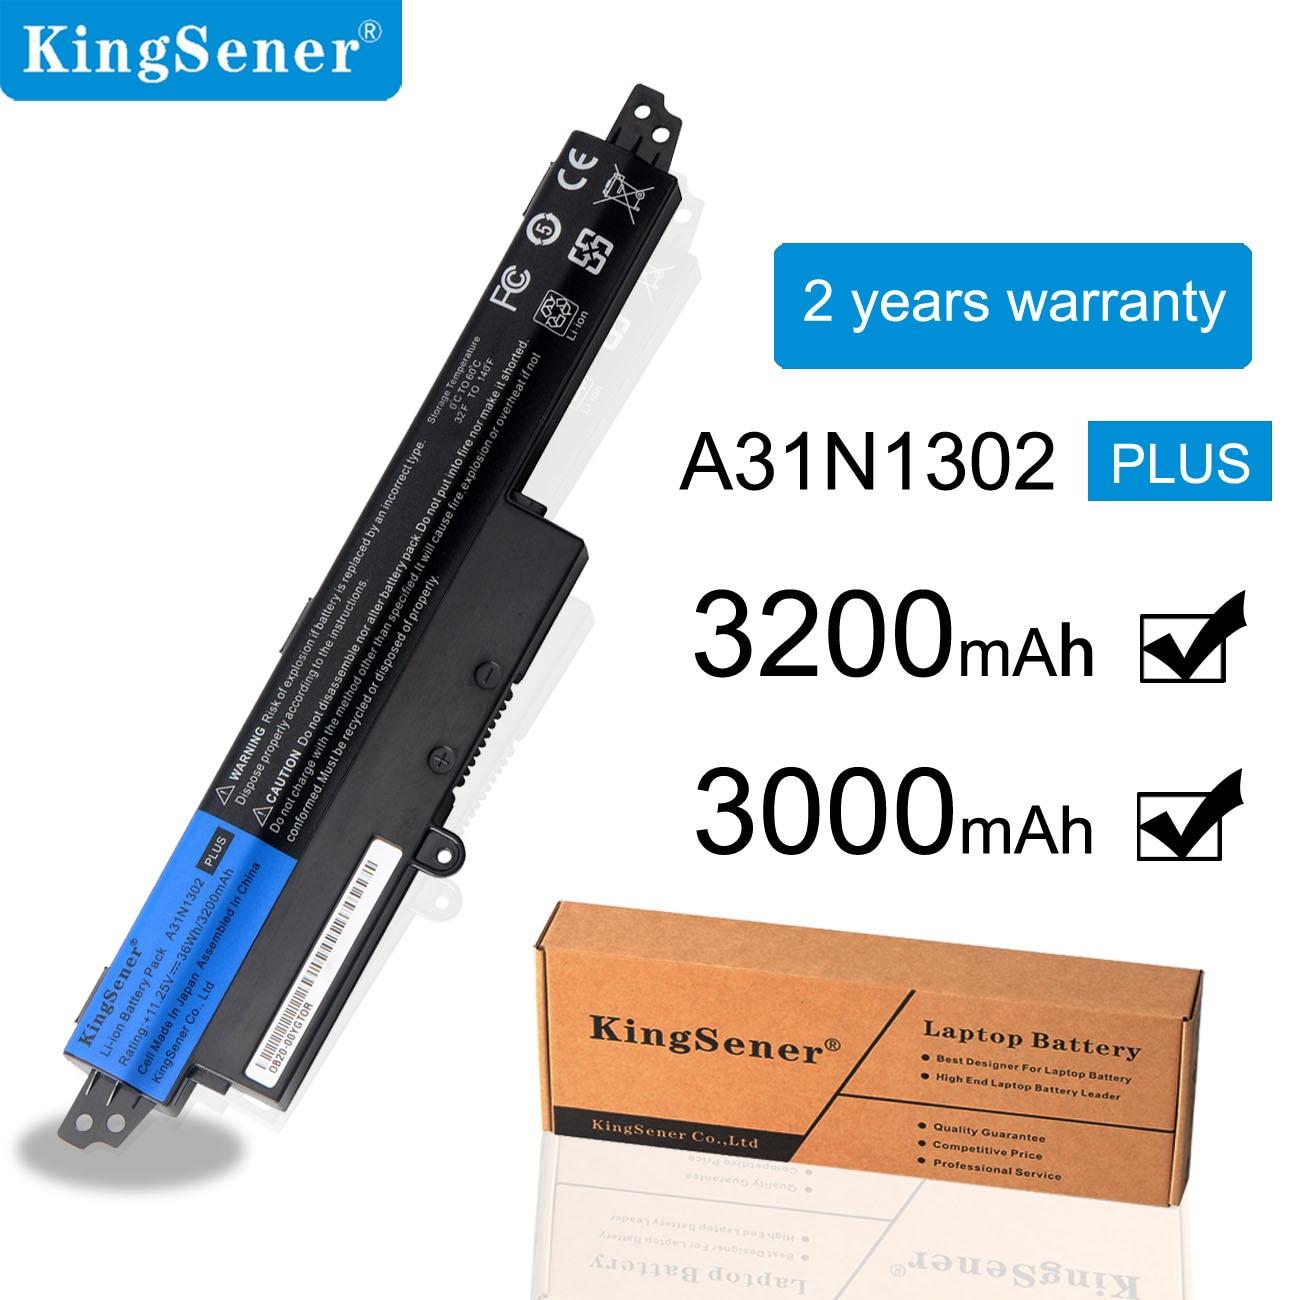 a31n1302 koupit v moskvě - KingSener Korea cell A31N1302 Battery For ASUS VivoBook X200CA X200MA X200M X200LA F200CA X200CA R200CA 11.6 A31LMH2 A31LM9H